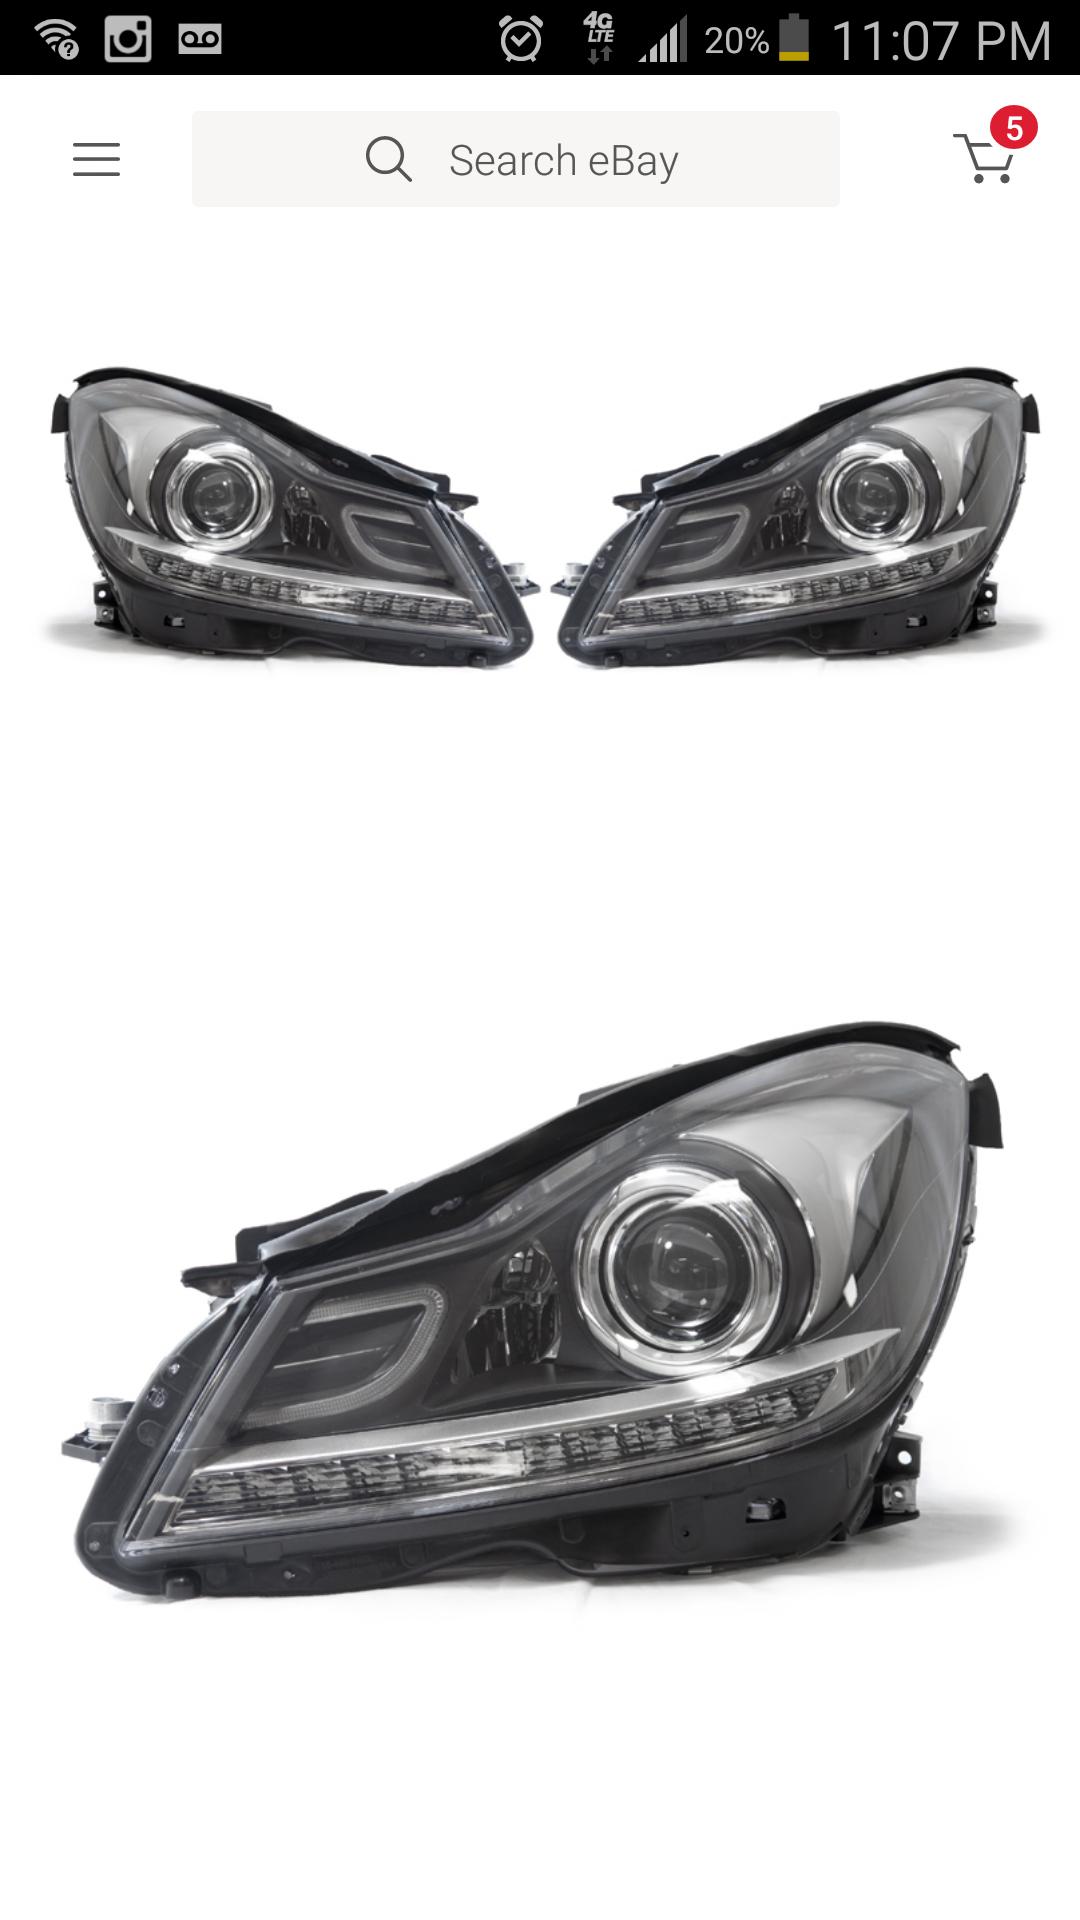 2008 C300 Facelift Headlight Help